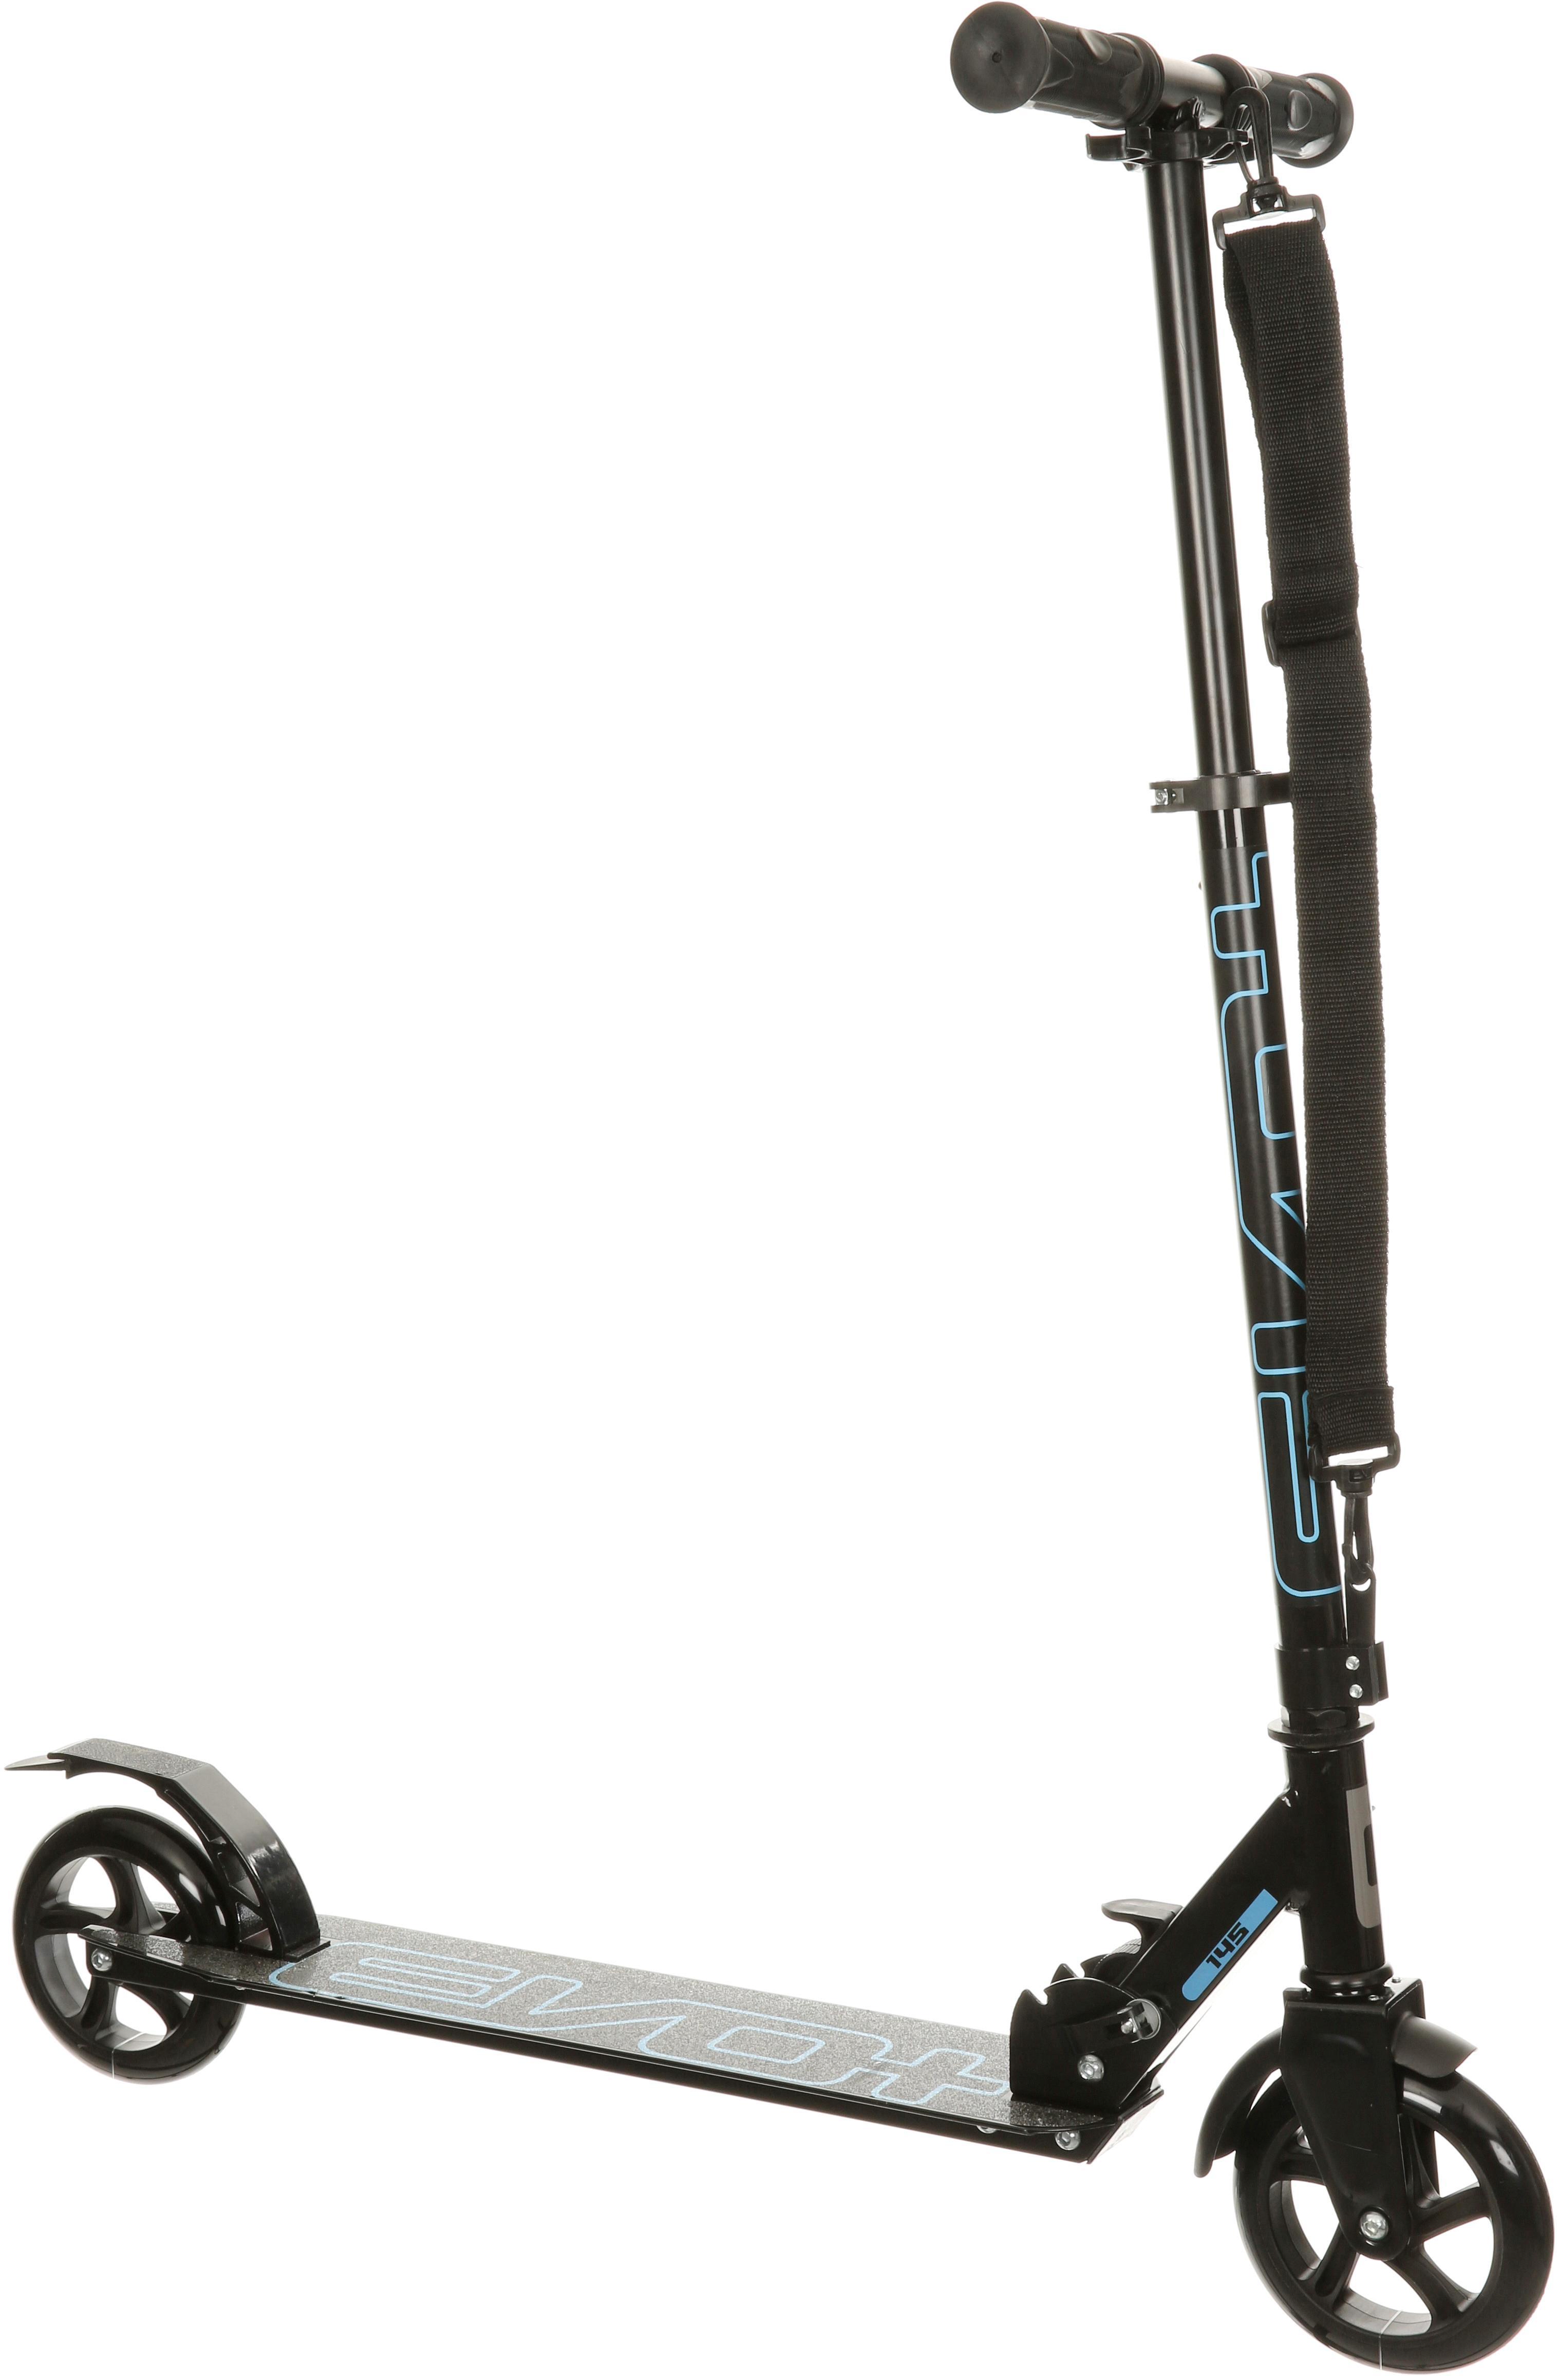 Evo+ Commuter Kids Scooter - 145Mm Wheel